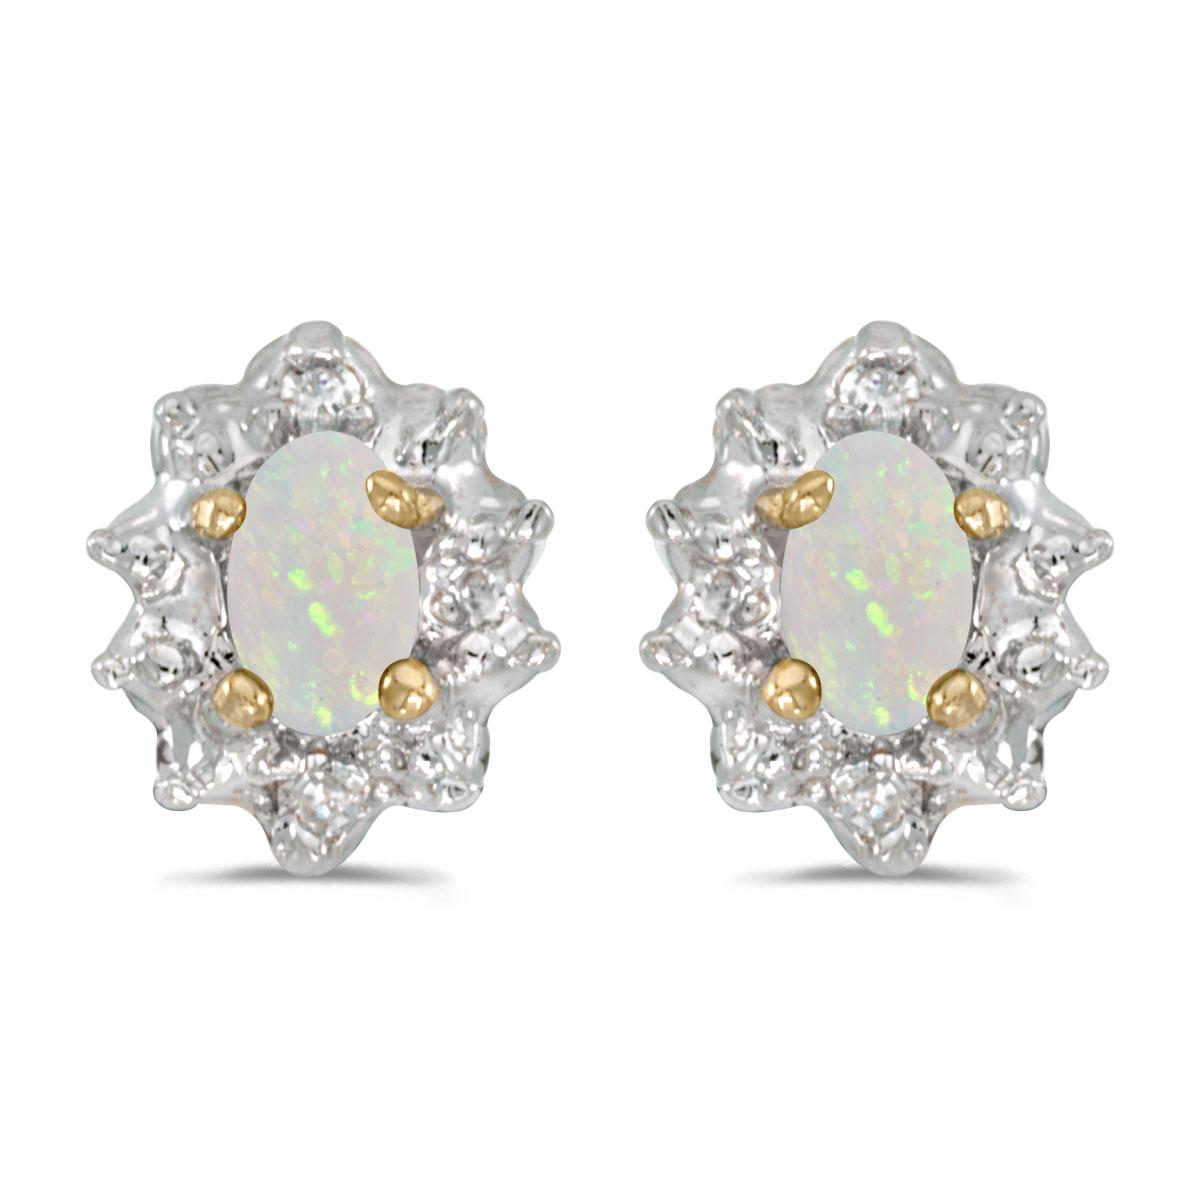 14k White Gold Oval Opal And Diamond Earrings